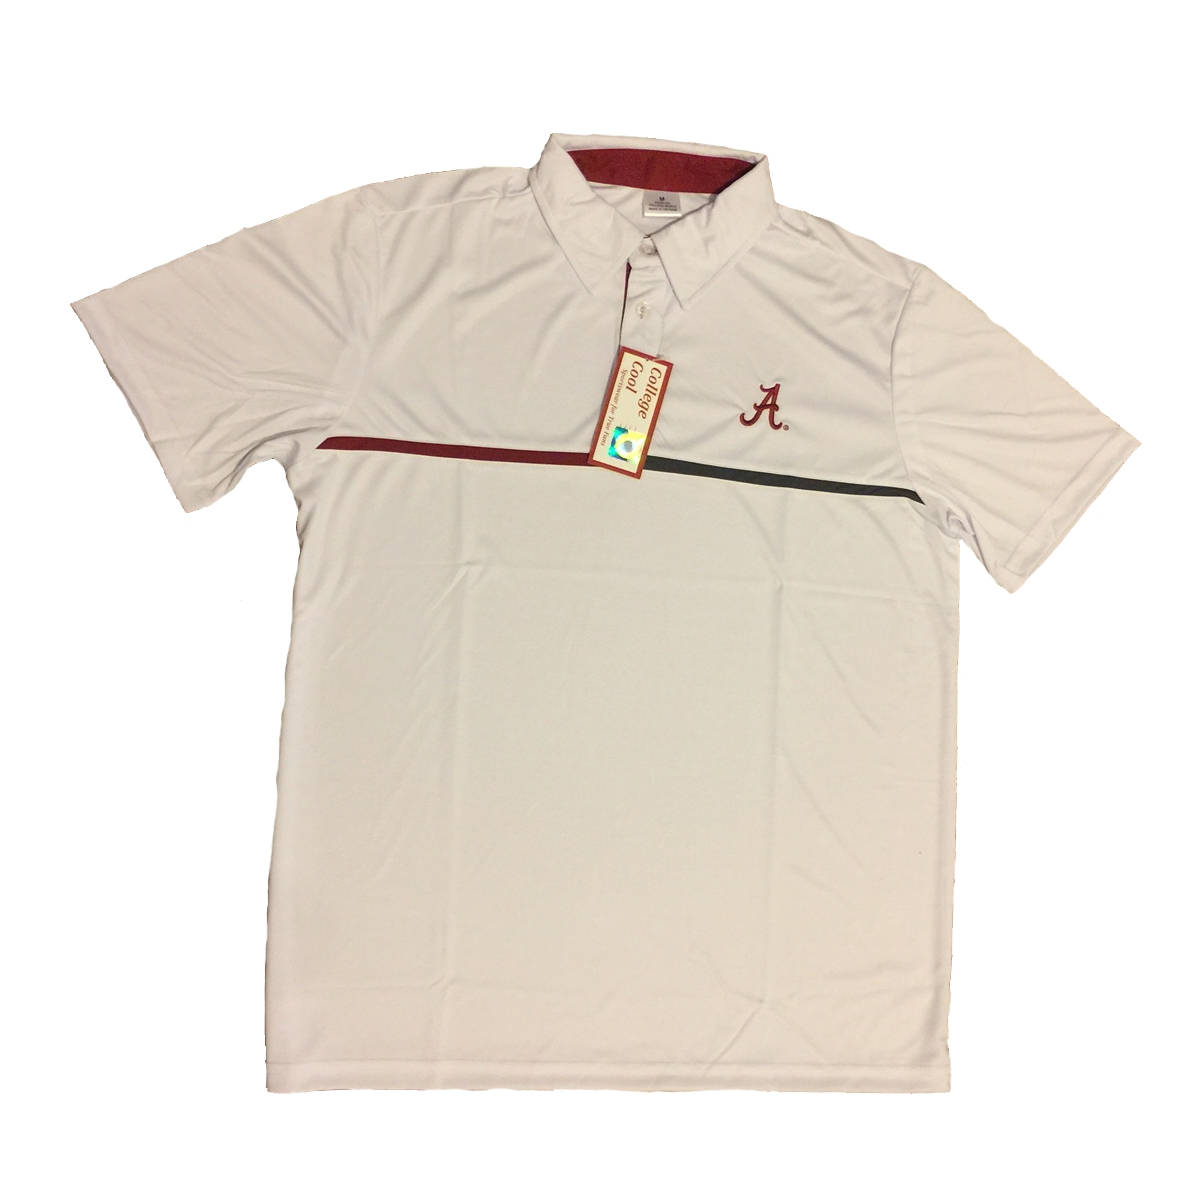 Alabama Crimson Tide White Polo Bama White Polo Alabama Crimson